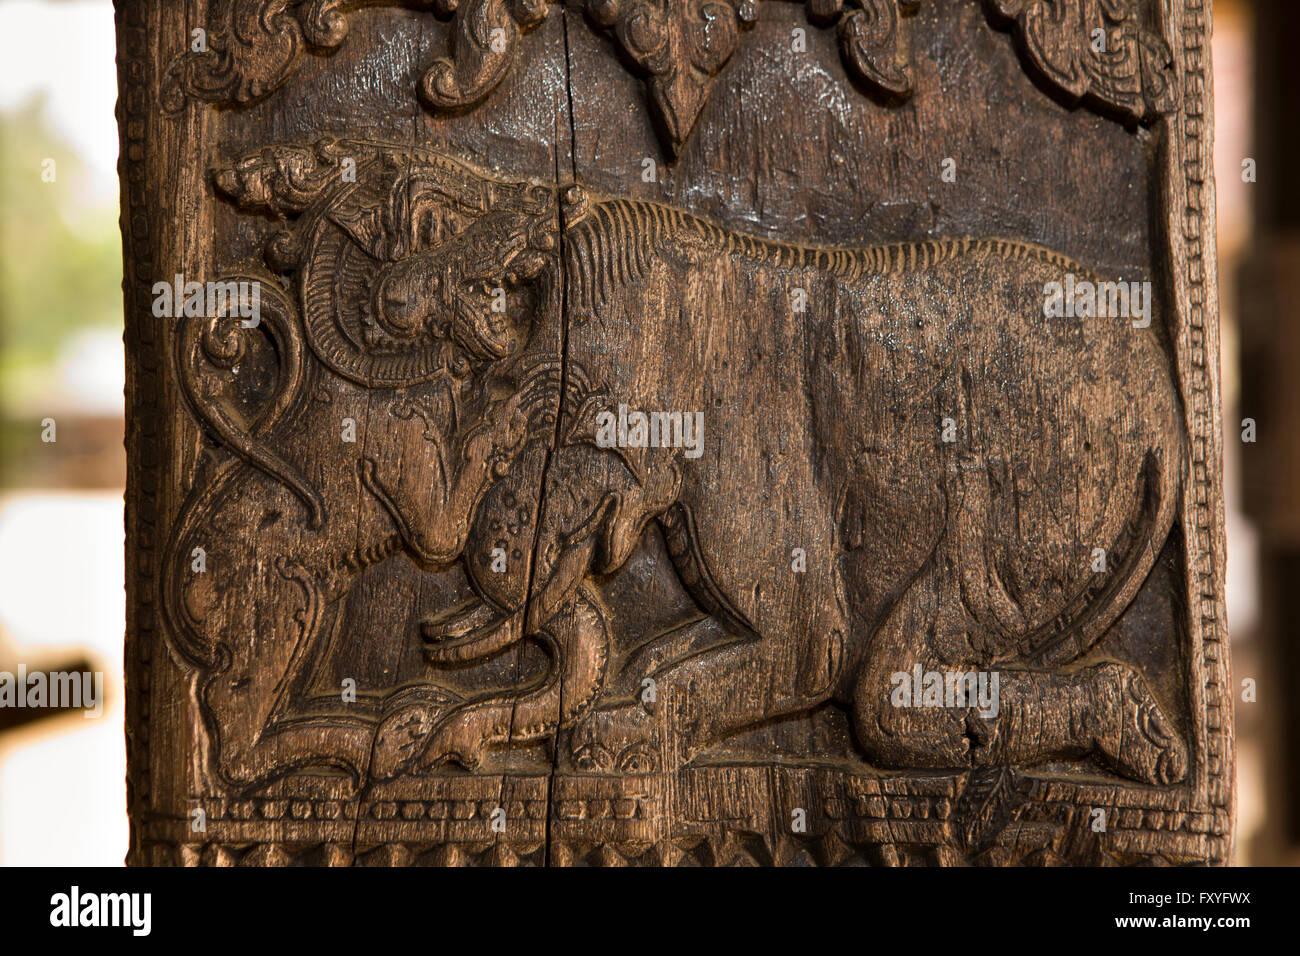 Sri Lanka, Kandy, Embekke Devale, digge pavilion, lion fighting elephant carving on wooden pillar Stock Photo